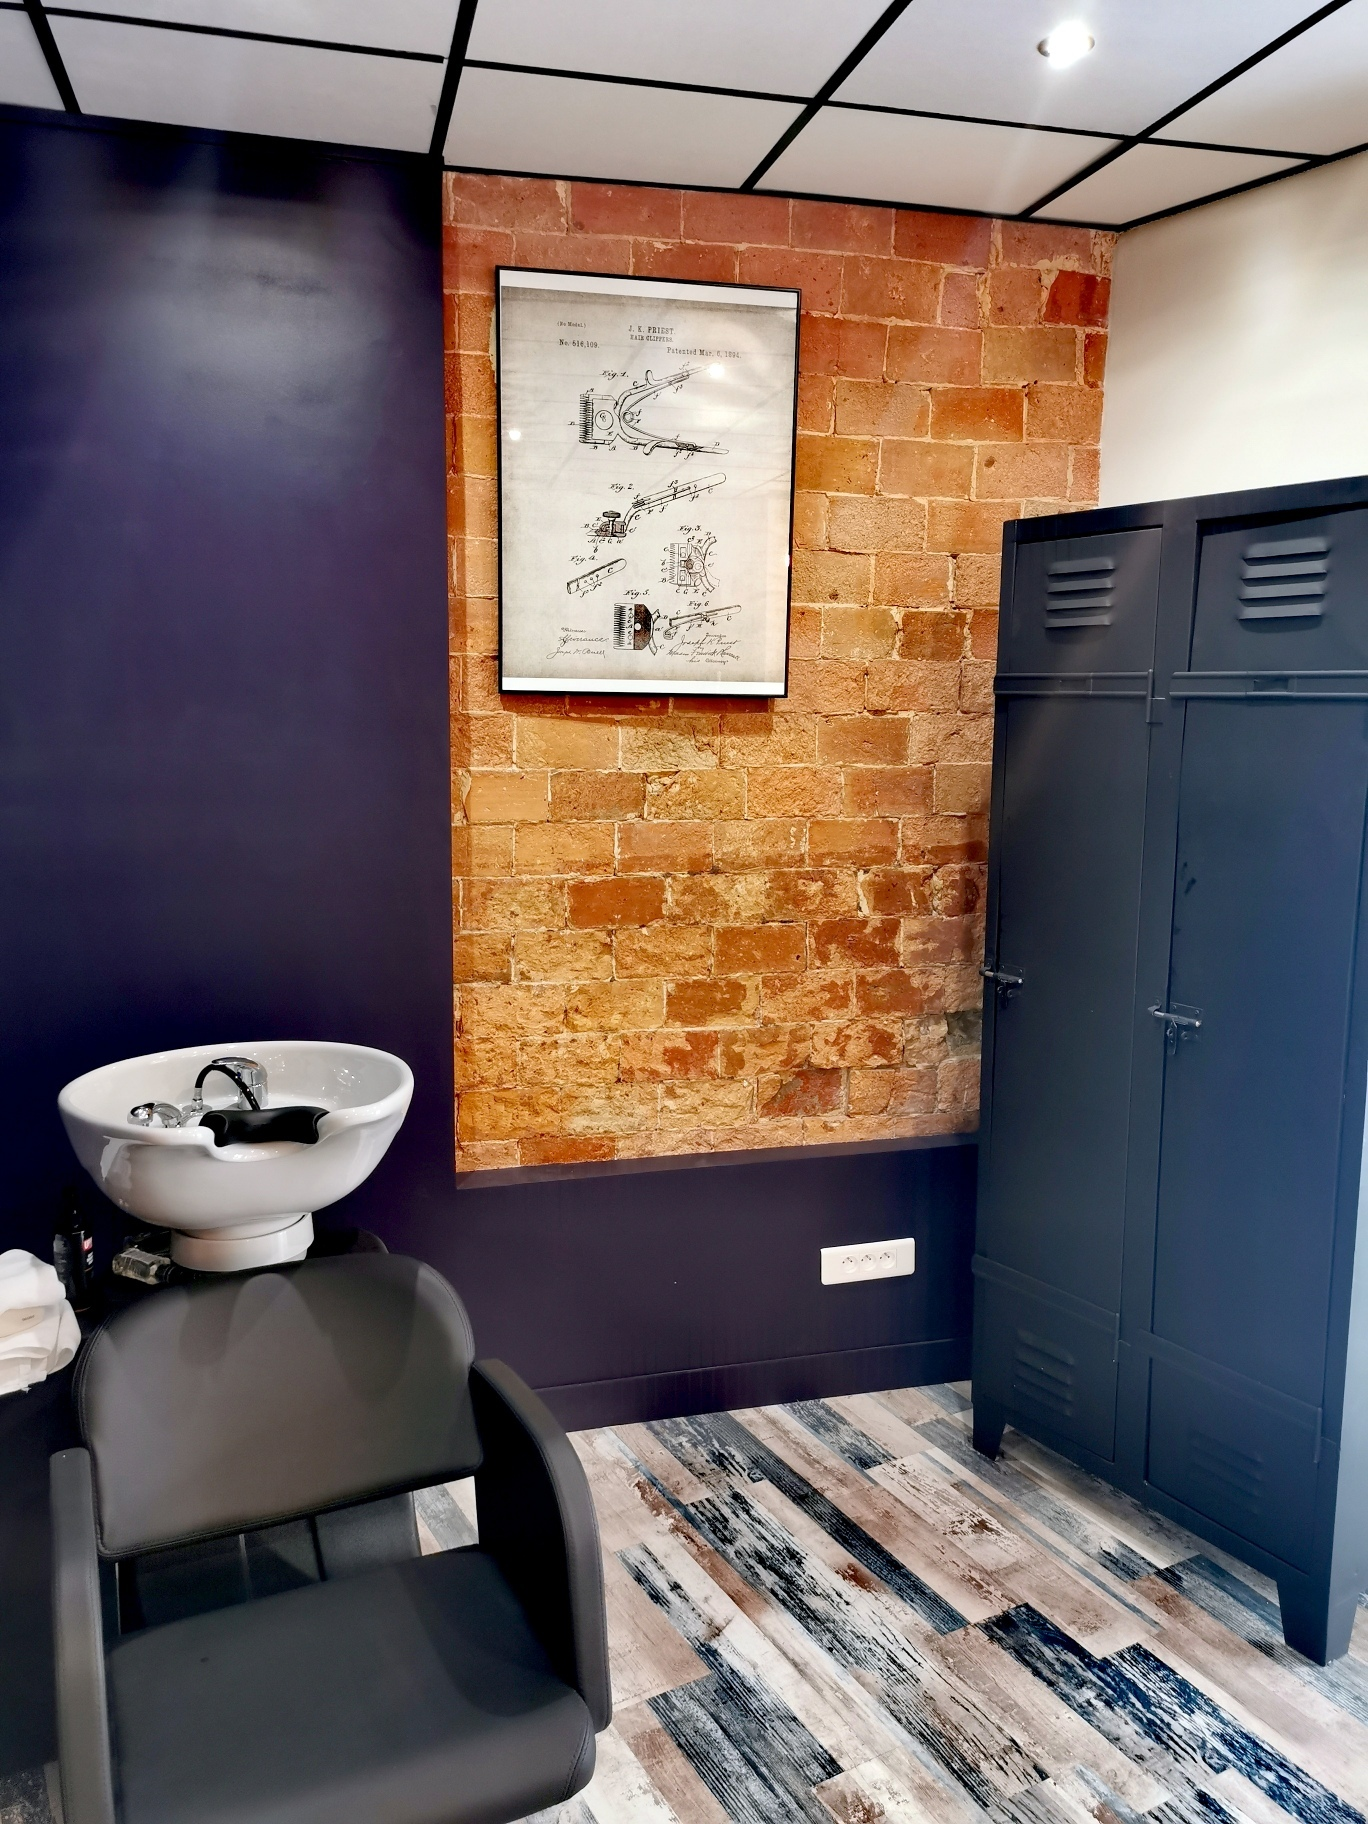 Galerie d'image - Messieurs artisan Barbier